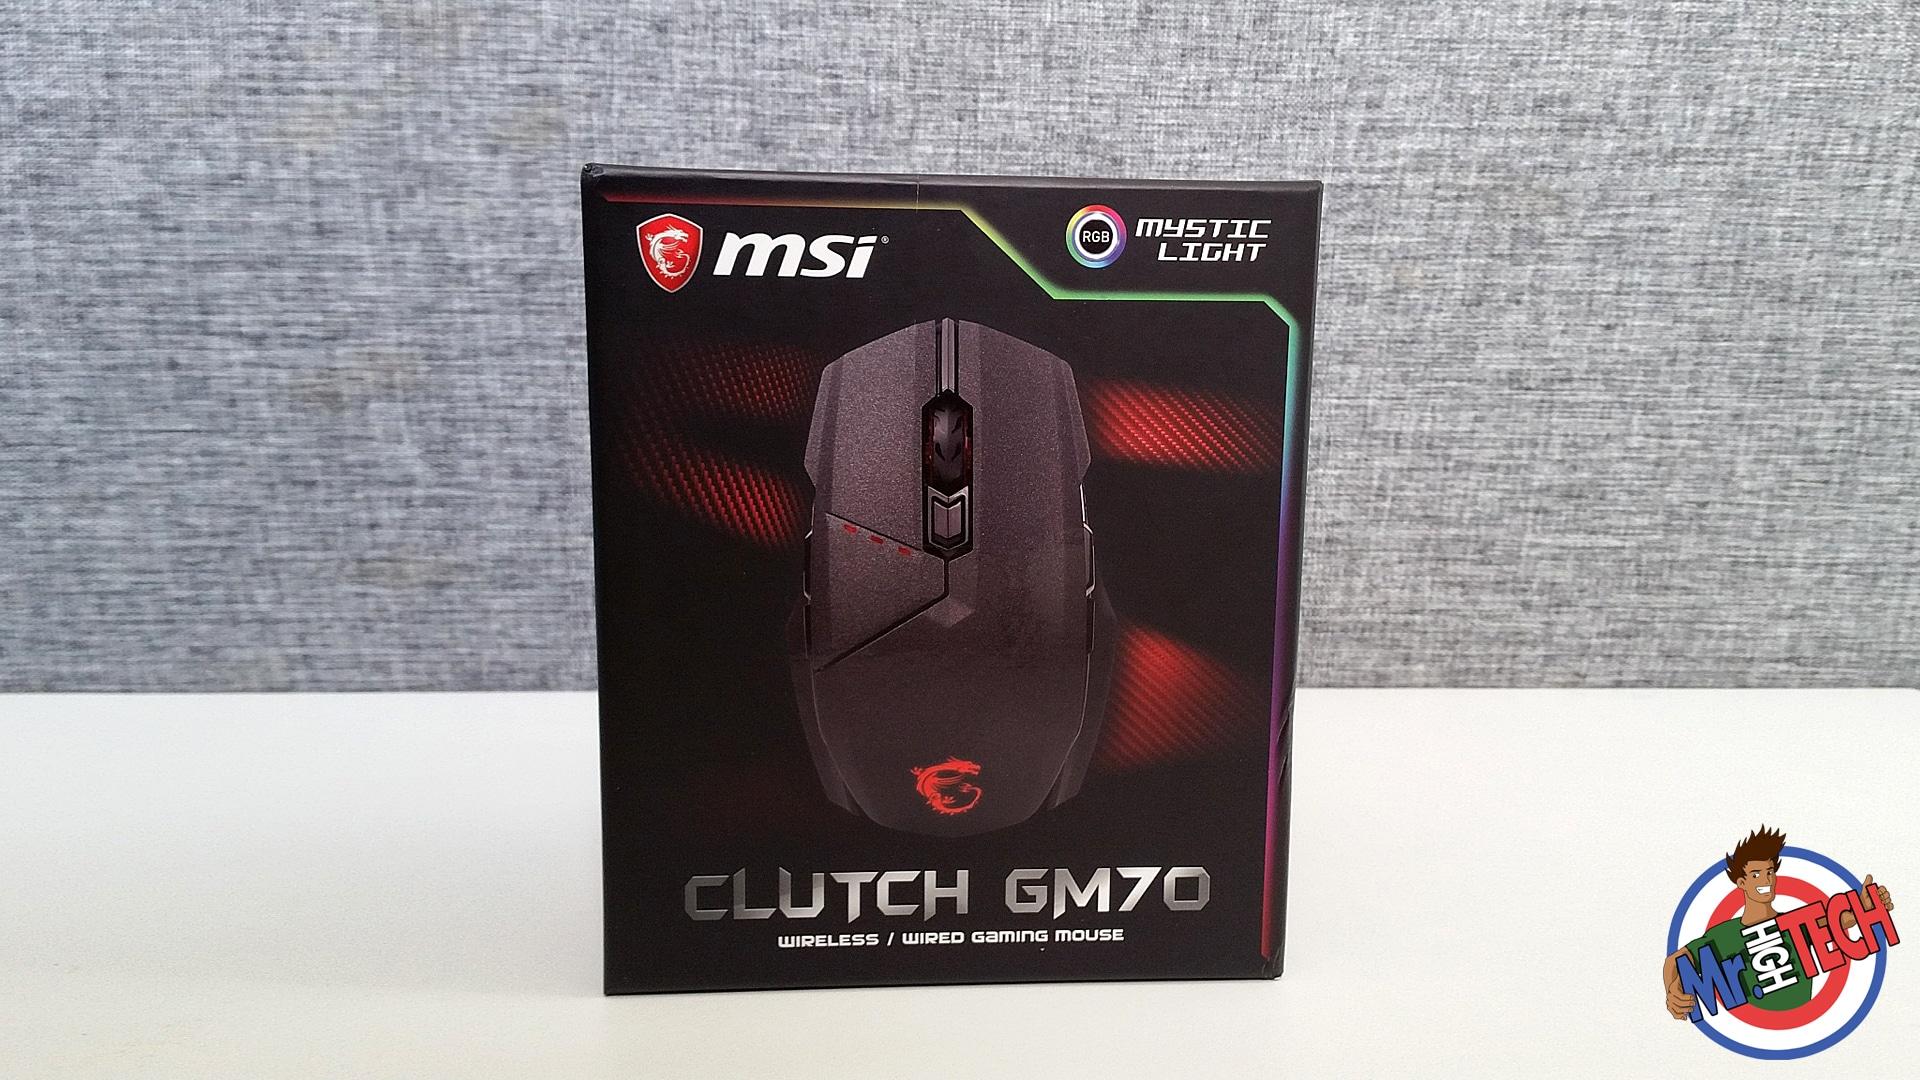 b7d98da1db6 MSI Clutch GM70 : Test de la souris gamer MSI et Avis complet